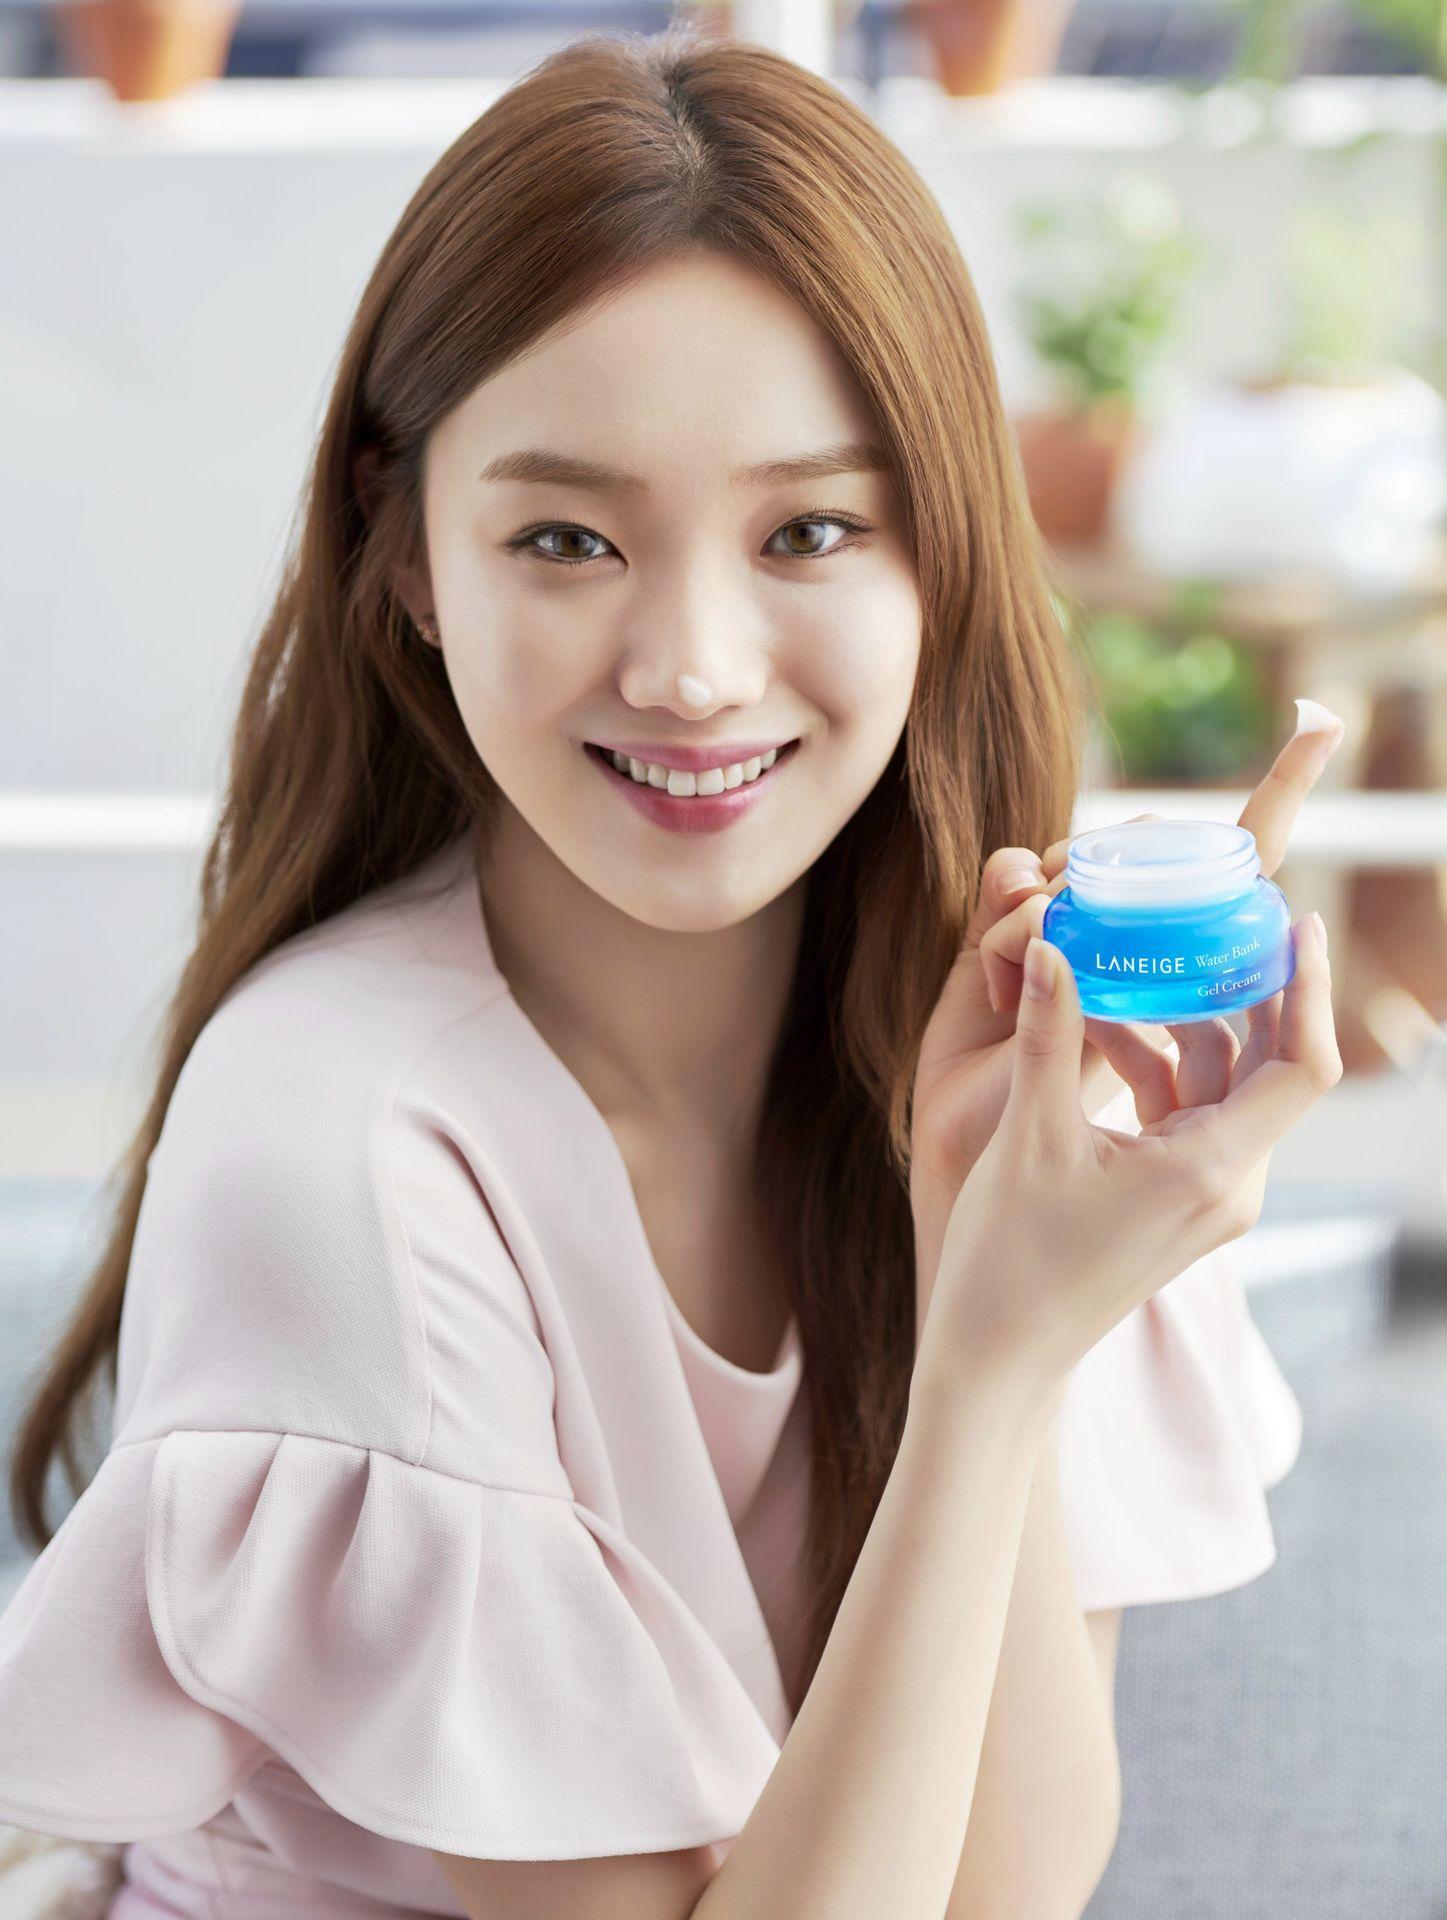 Basic Skin Care Tips, Information, & More